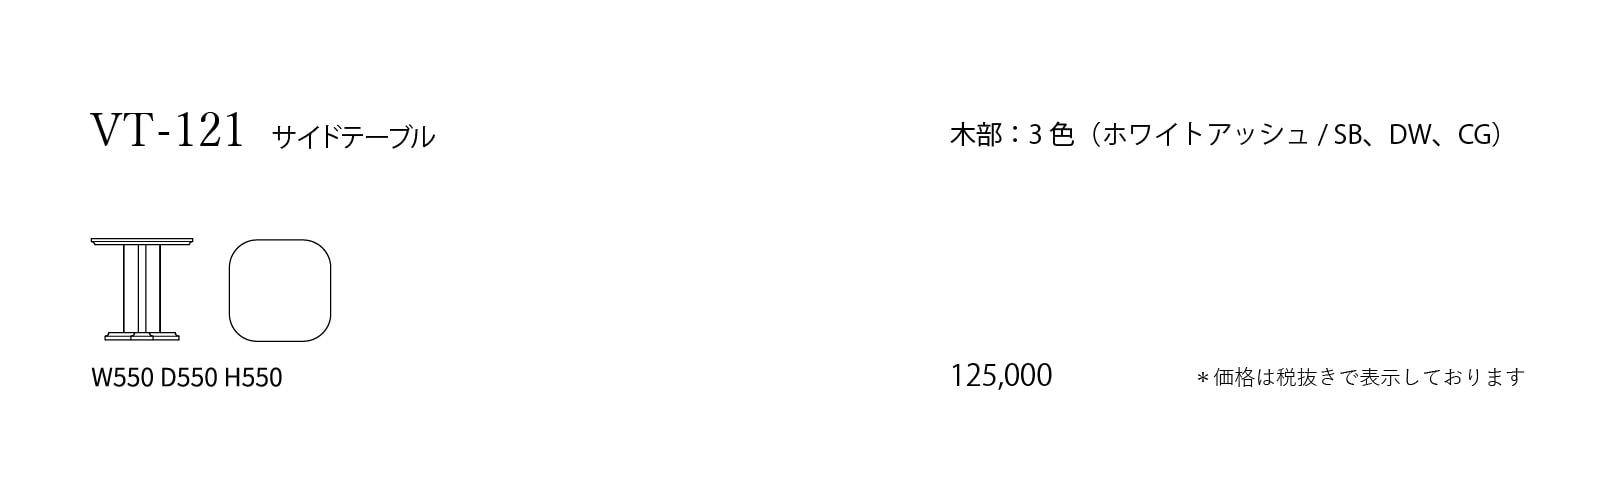 VT-121 Price List